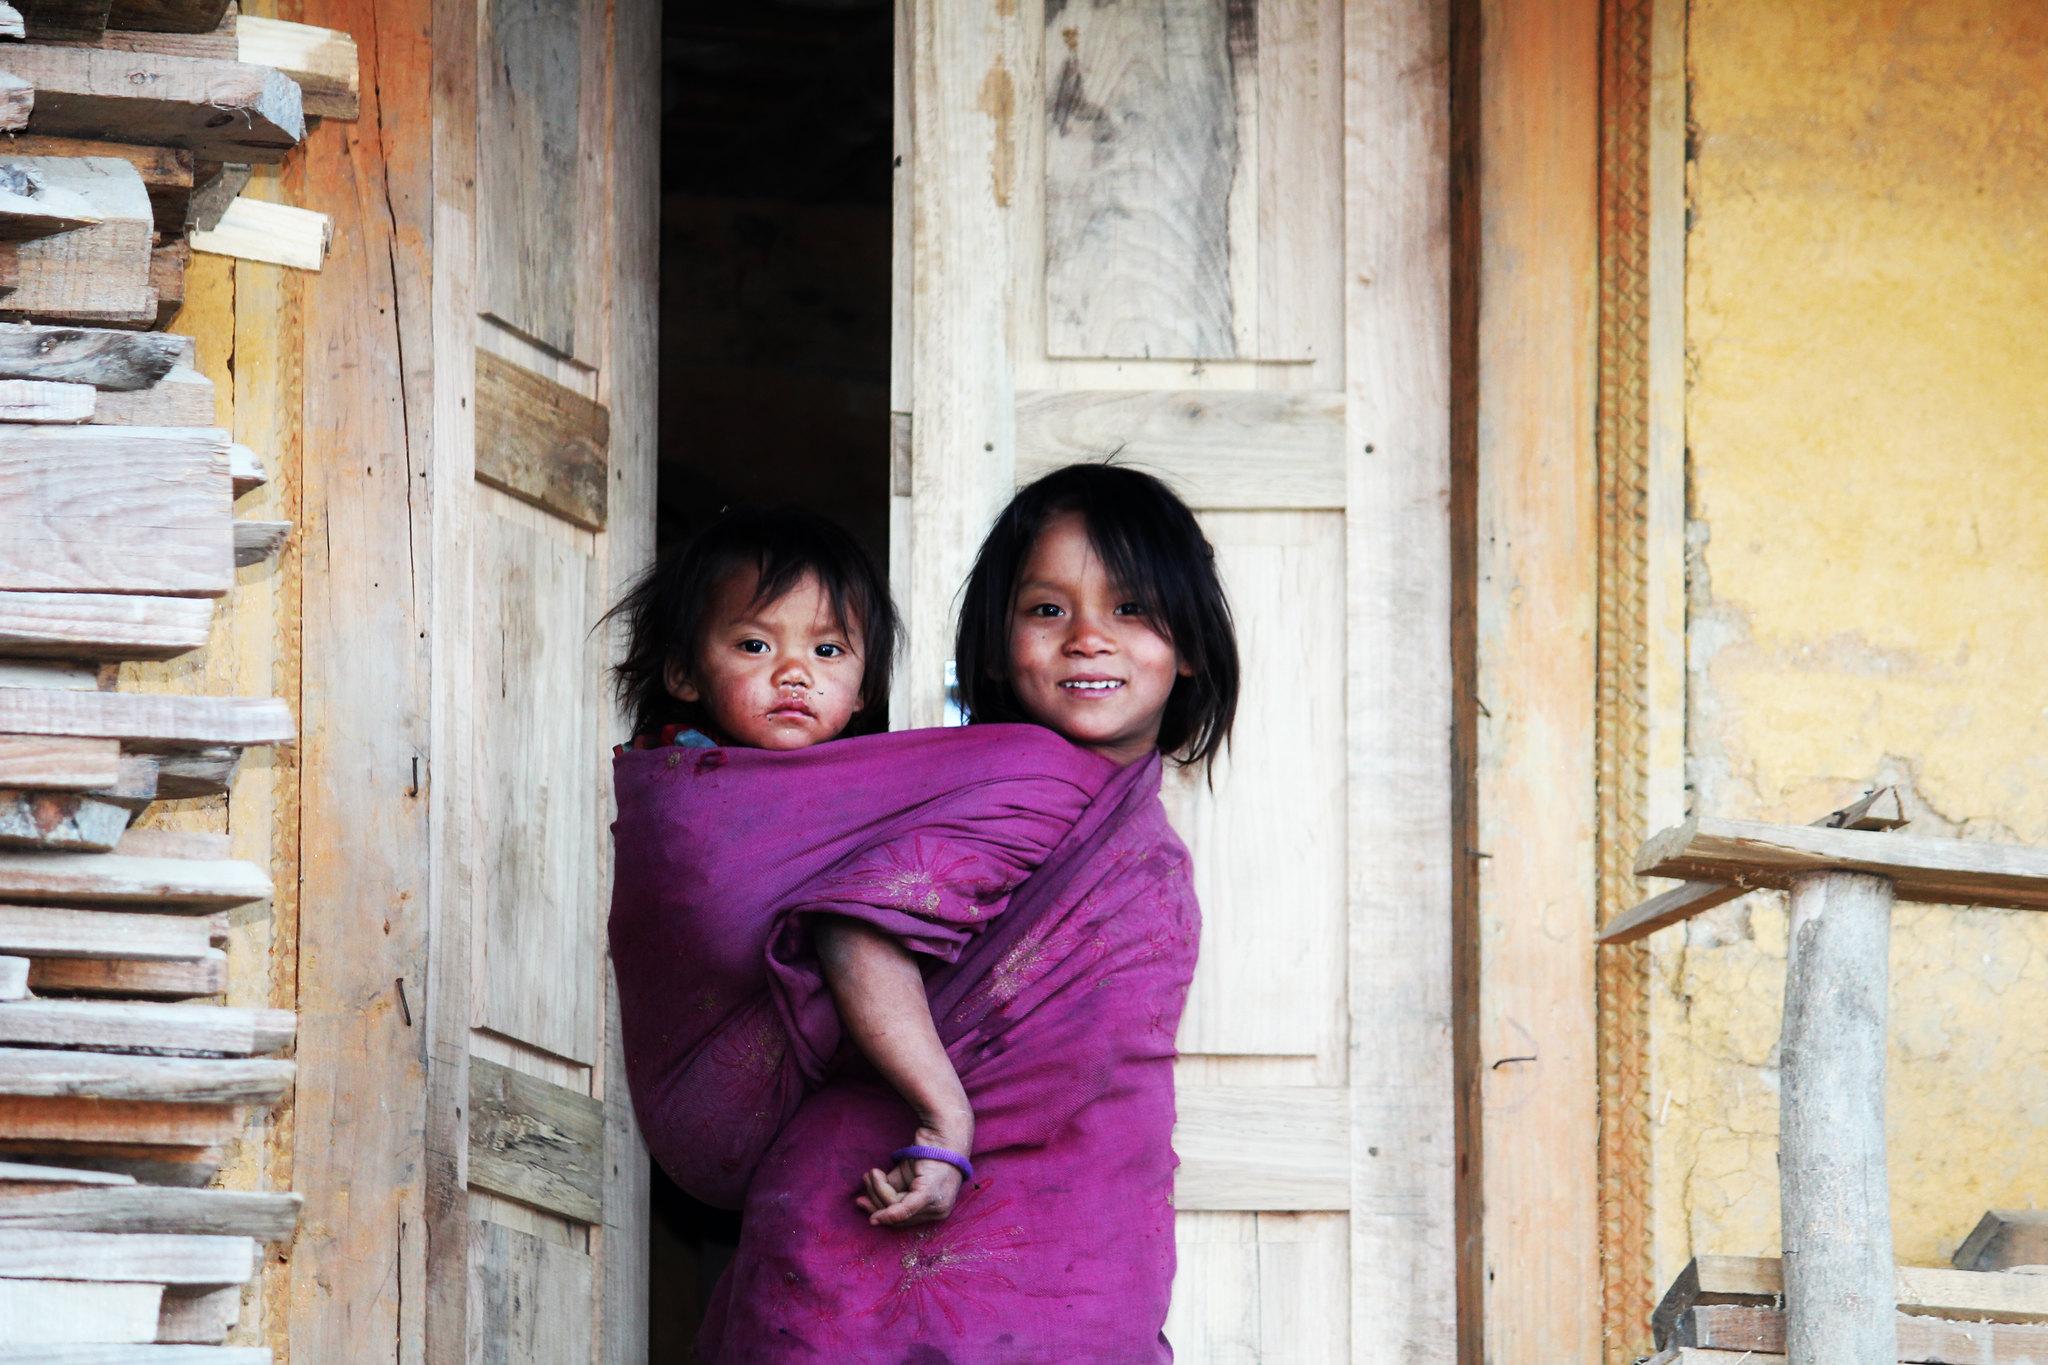 20 ресурсов для изучающих непали   Language Heroes Library школа хинди санскрита индологии